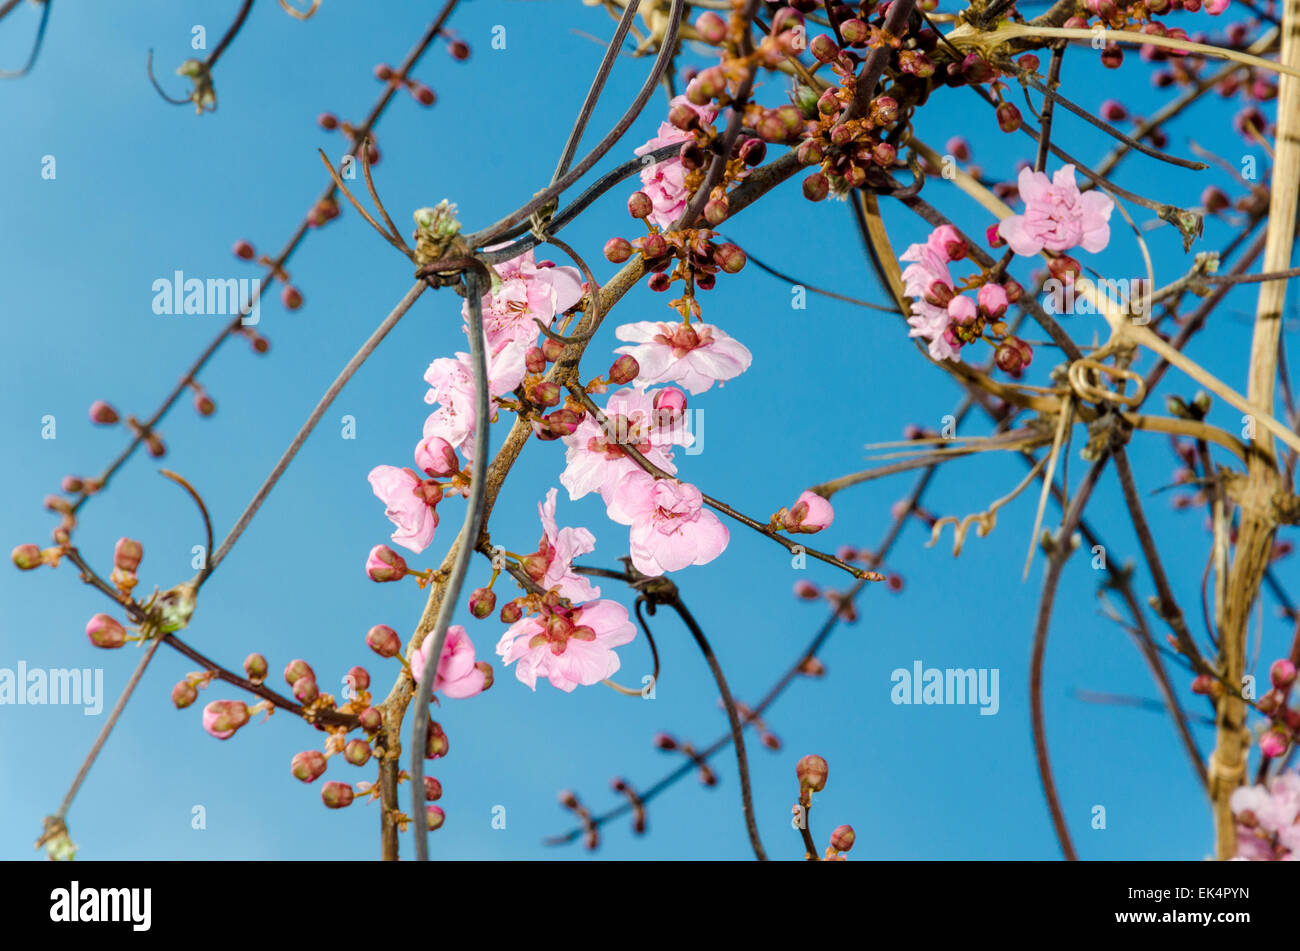 Blossom on an Ornamental Plum tree (also known as cherry plum, myrobalan plum, flowering plum, Prunus cerasifera) - Stock Image